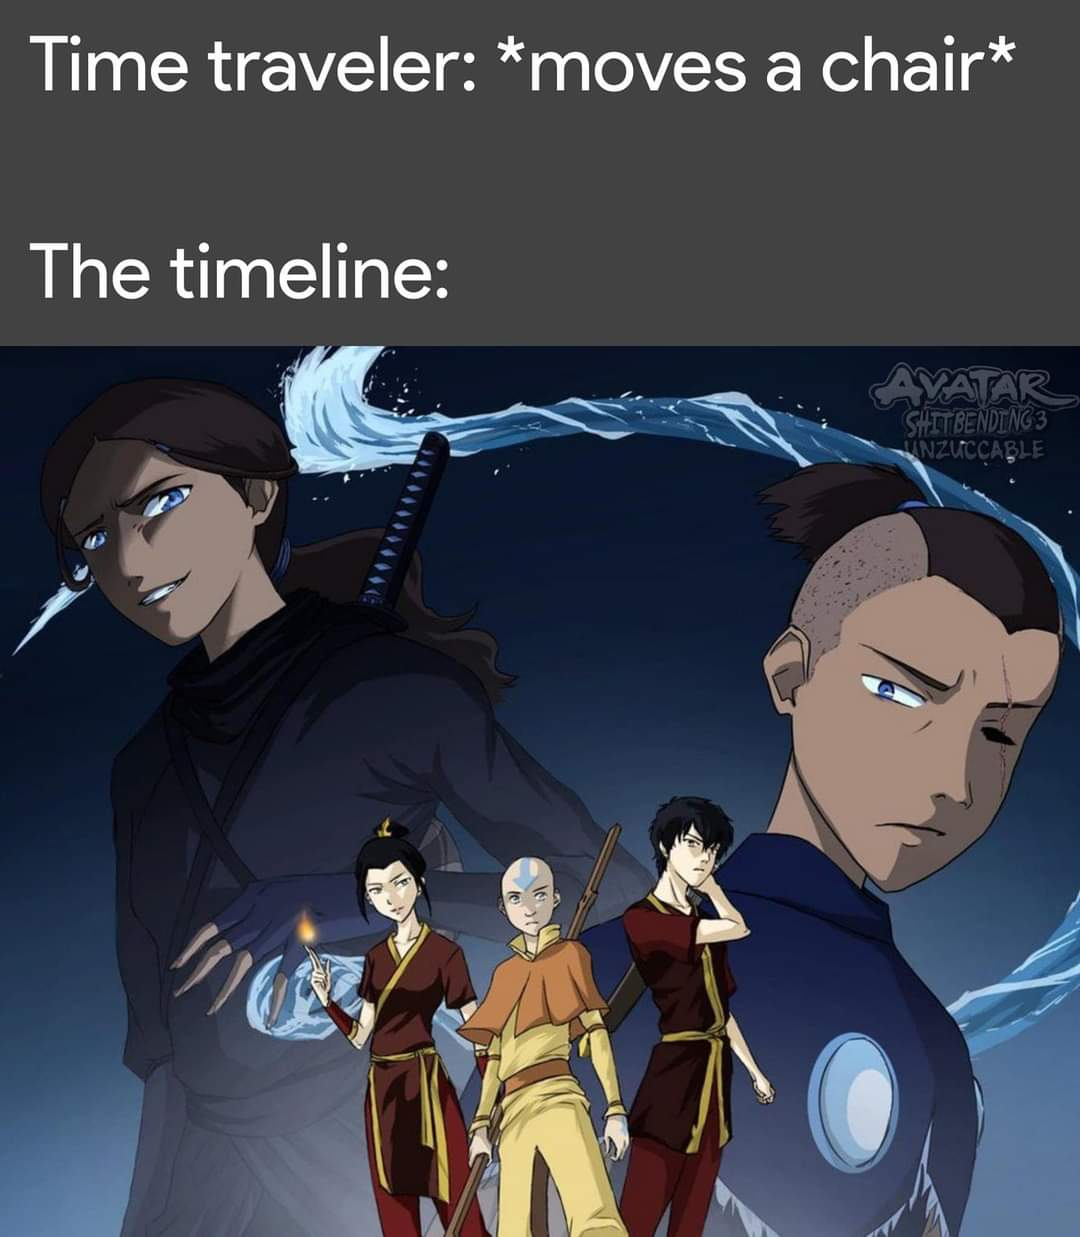 Memes alternate reality avatar the last Airbender